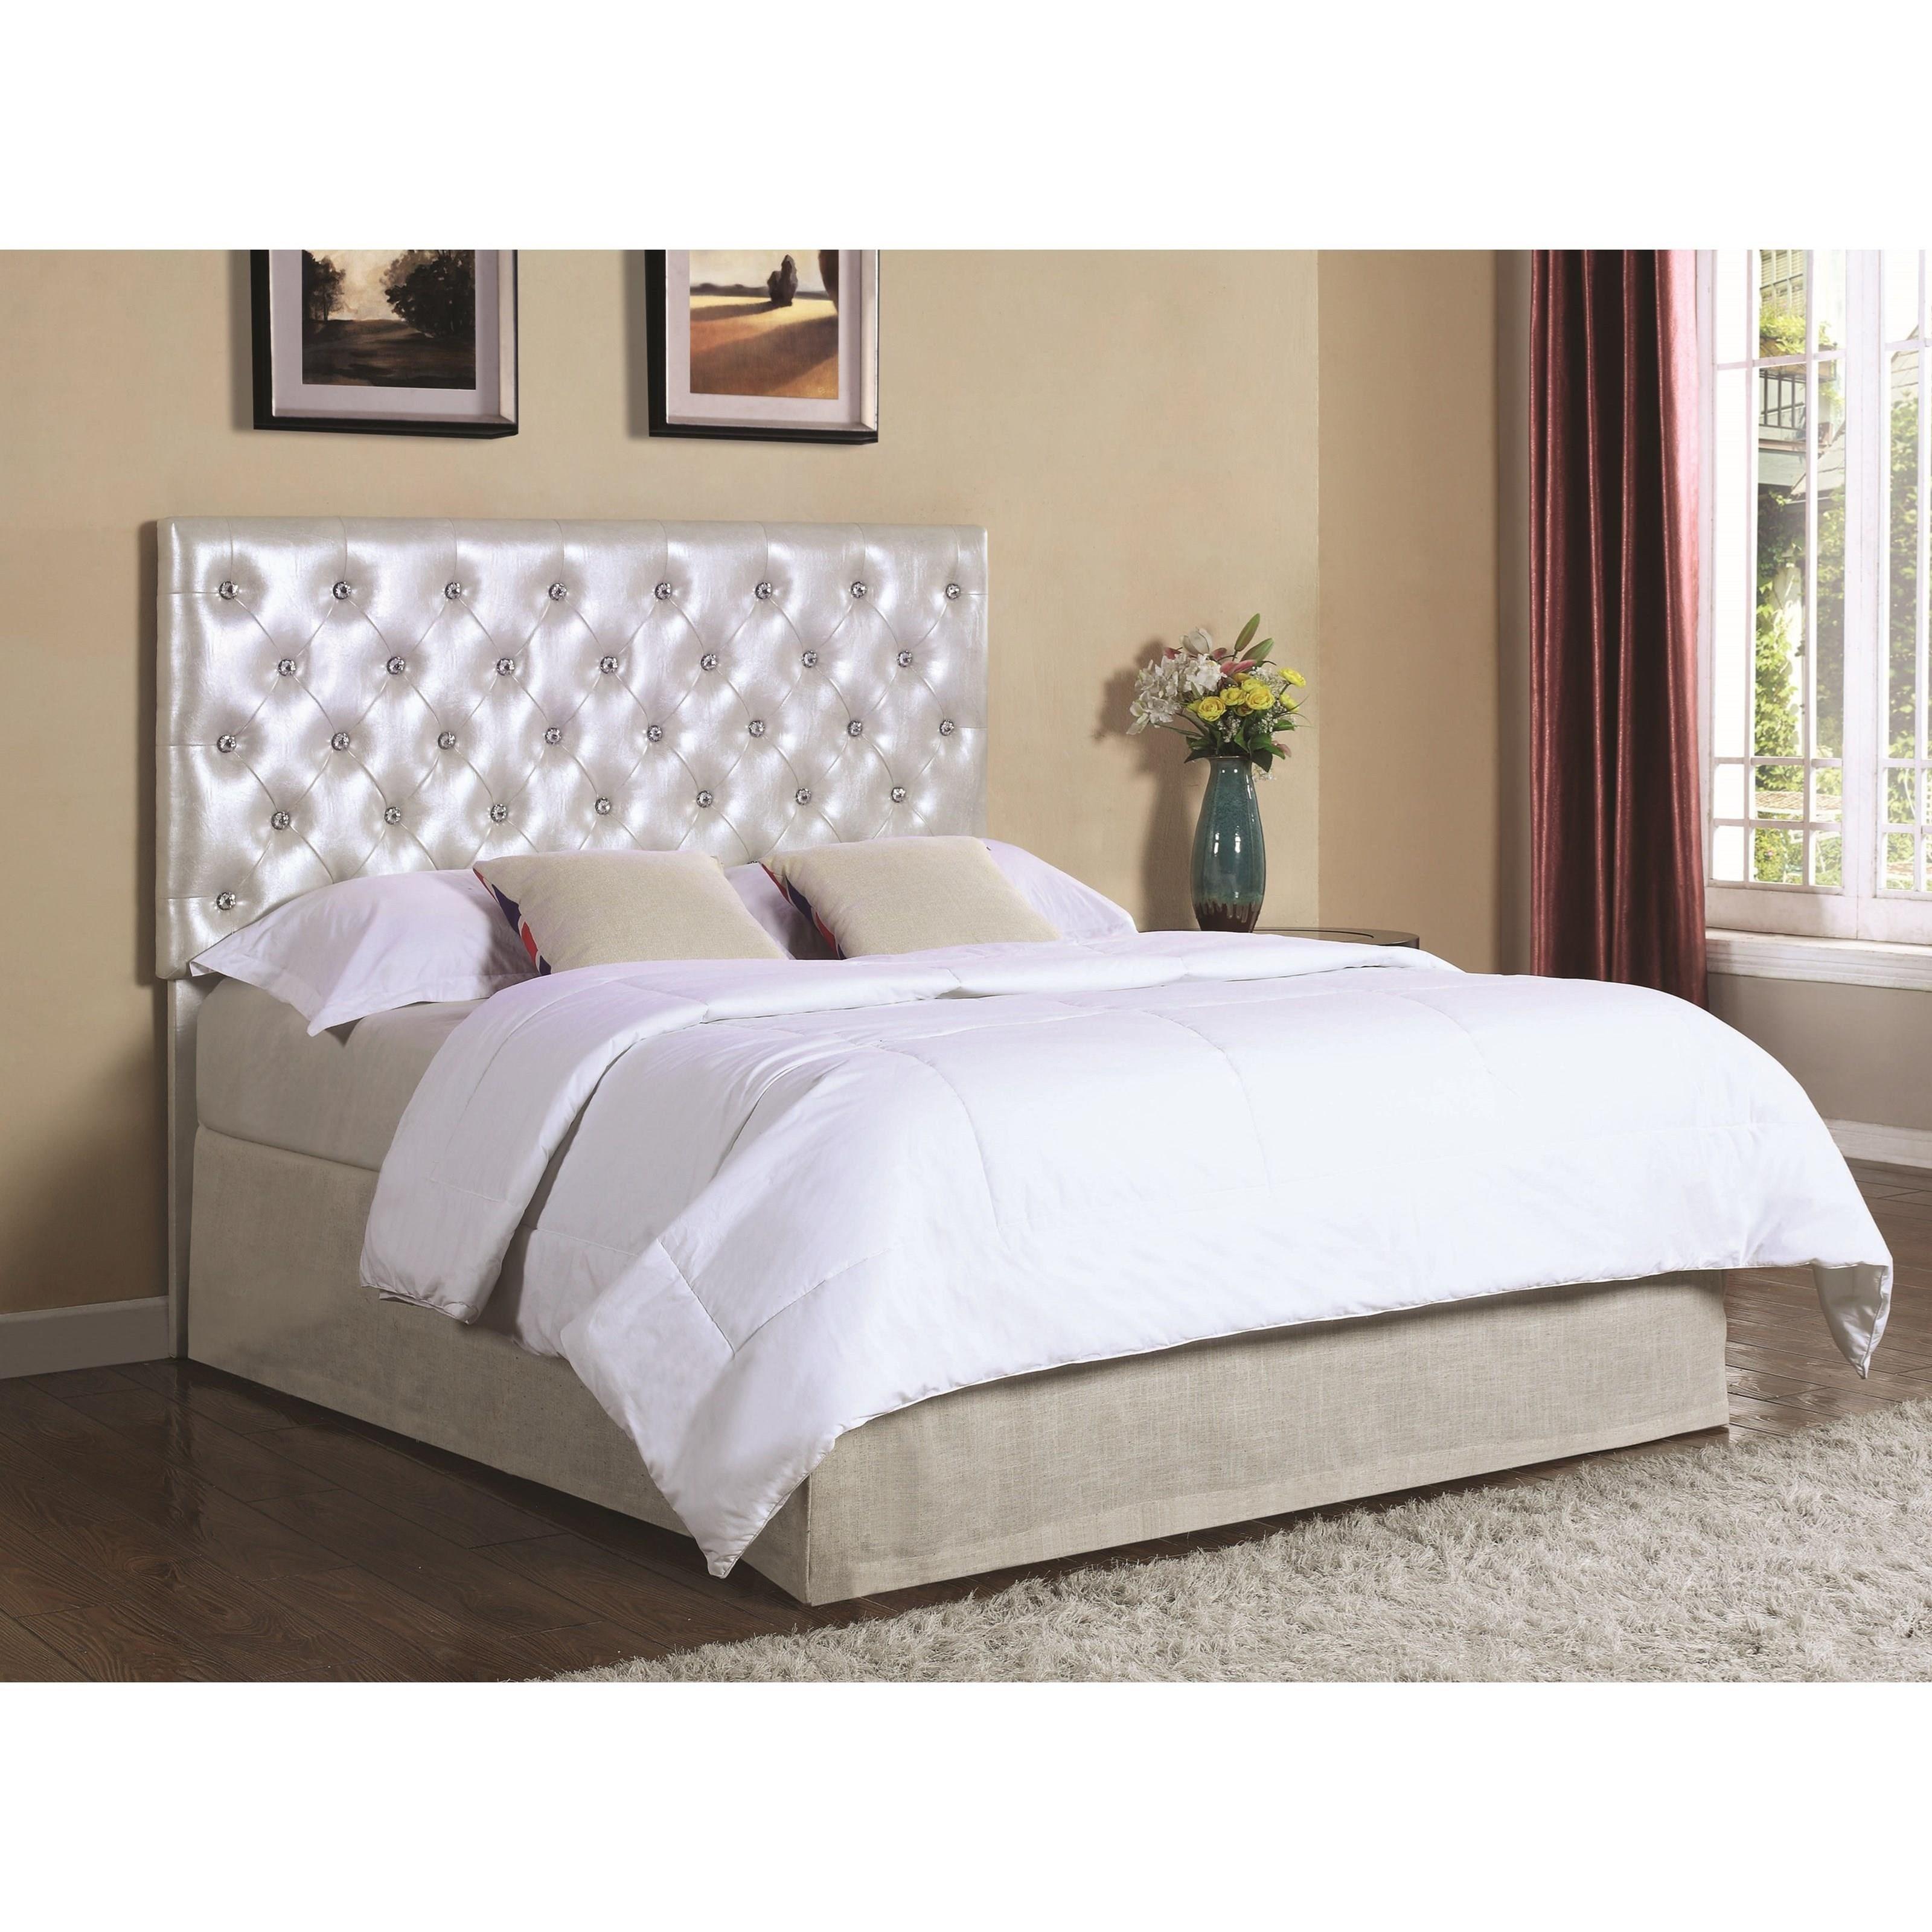 Coaster upholstered beds 300596k upholstered king for California king headboard